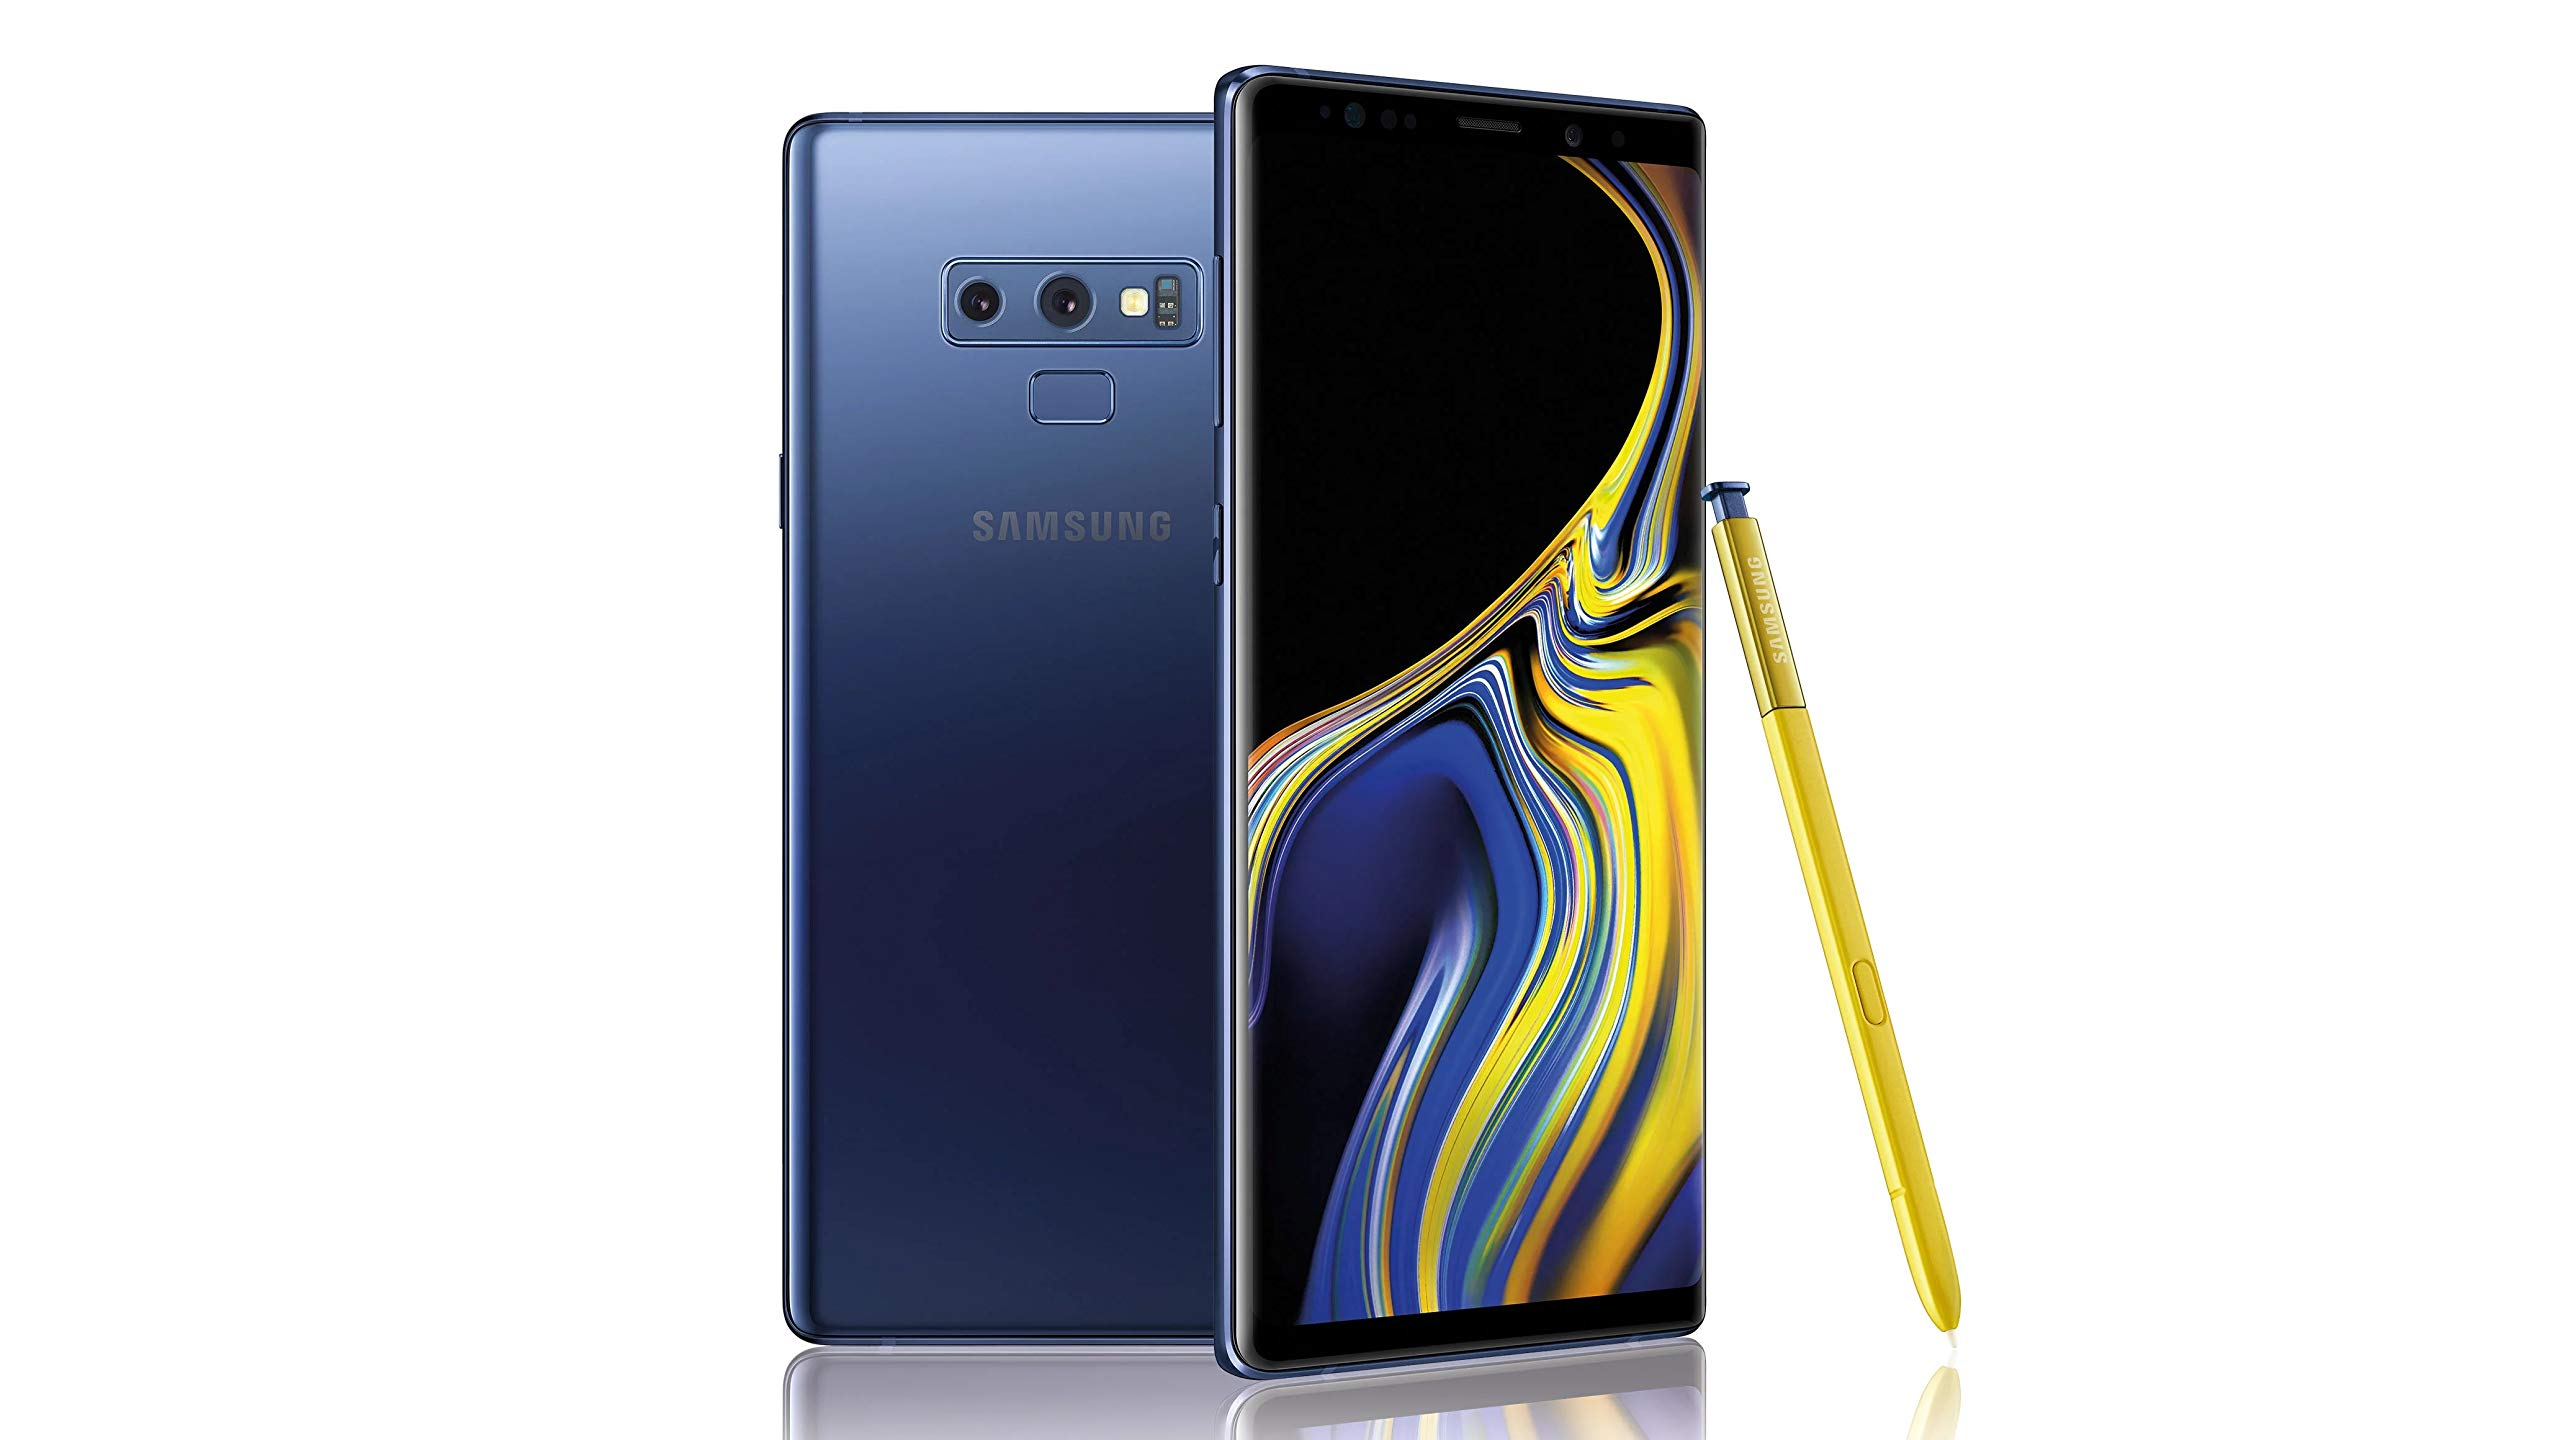 Samsung Galaxy Note9 Factory Unlocked Phone with 6.4in Screen and 512GB (U.S. Warranty), Ocean Blue (Renewed)